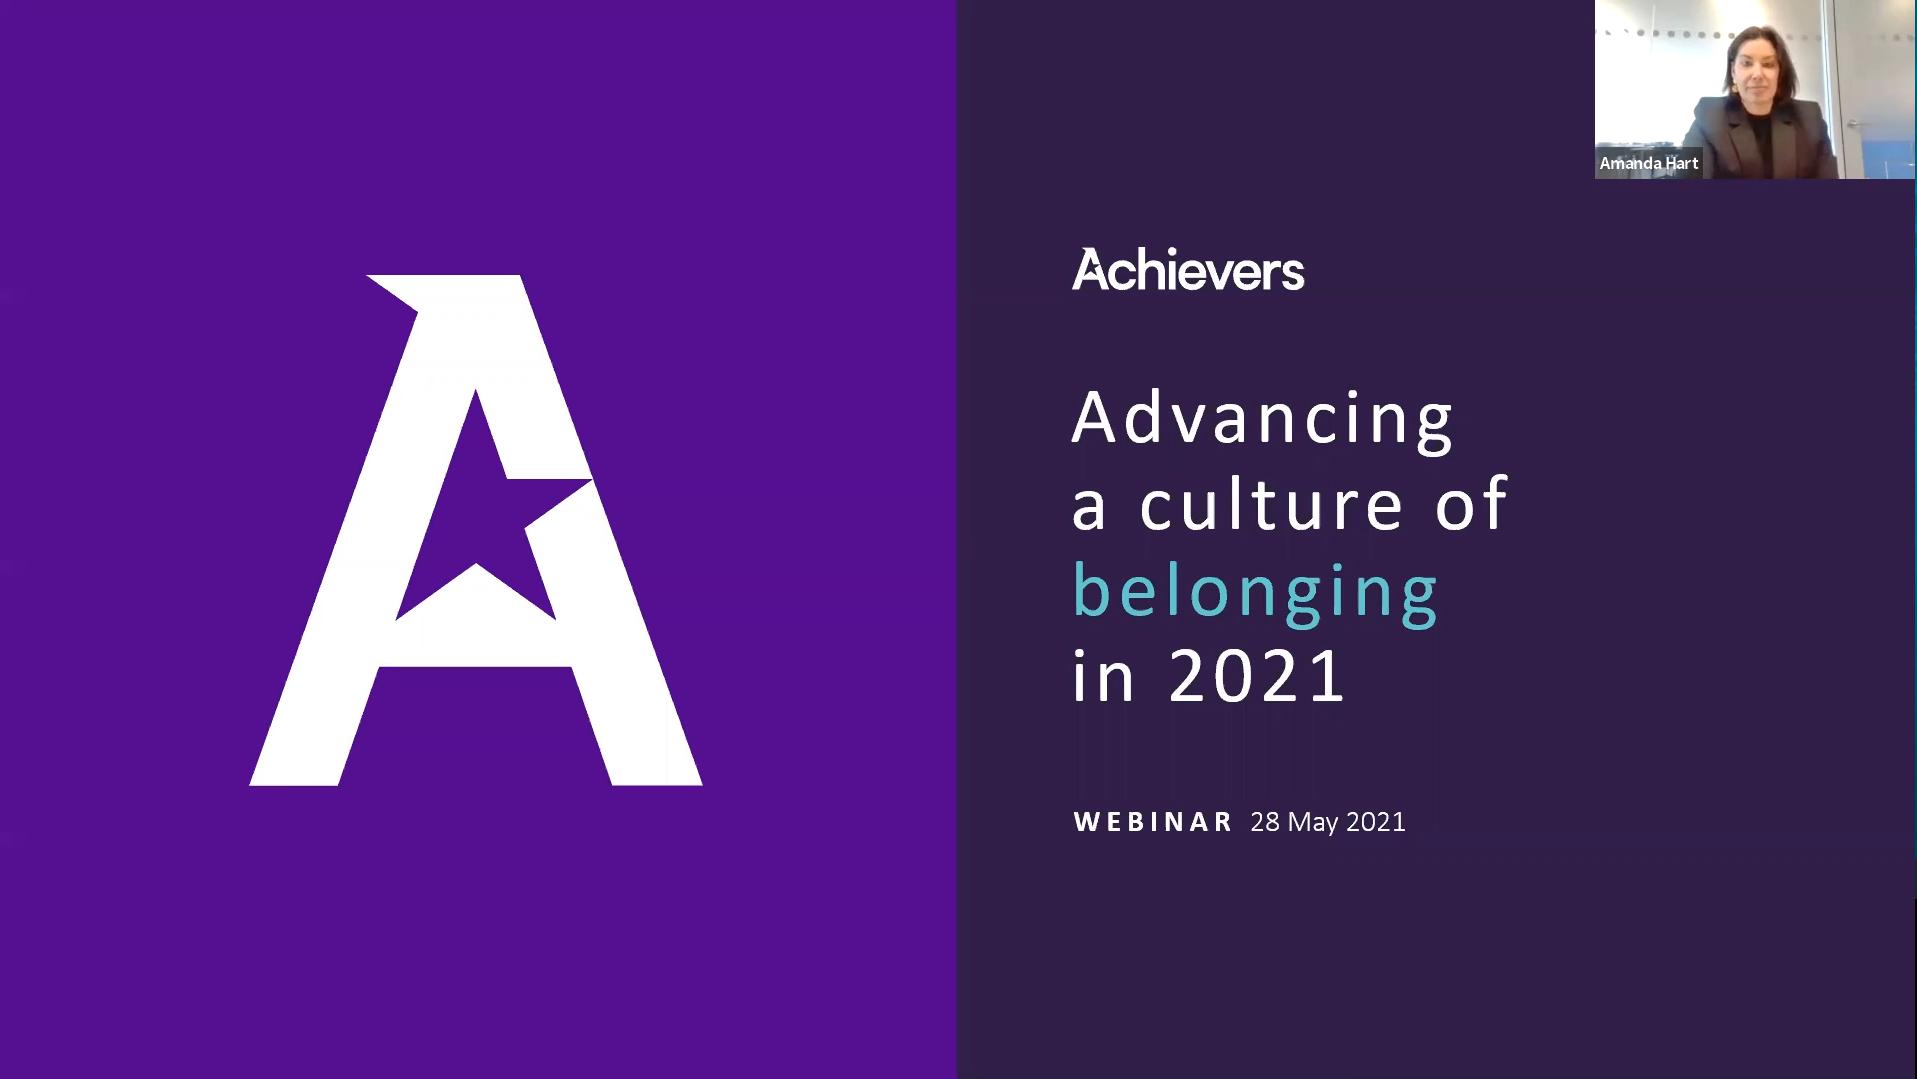 Advancing a Culture of Belonging in 2021